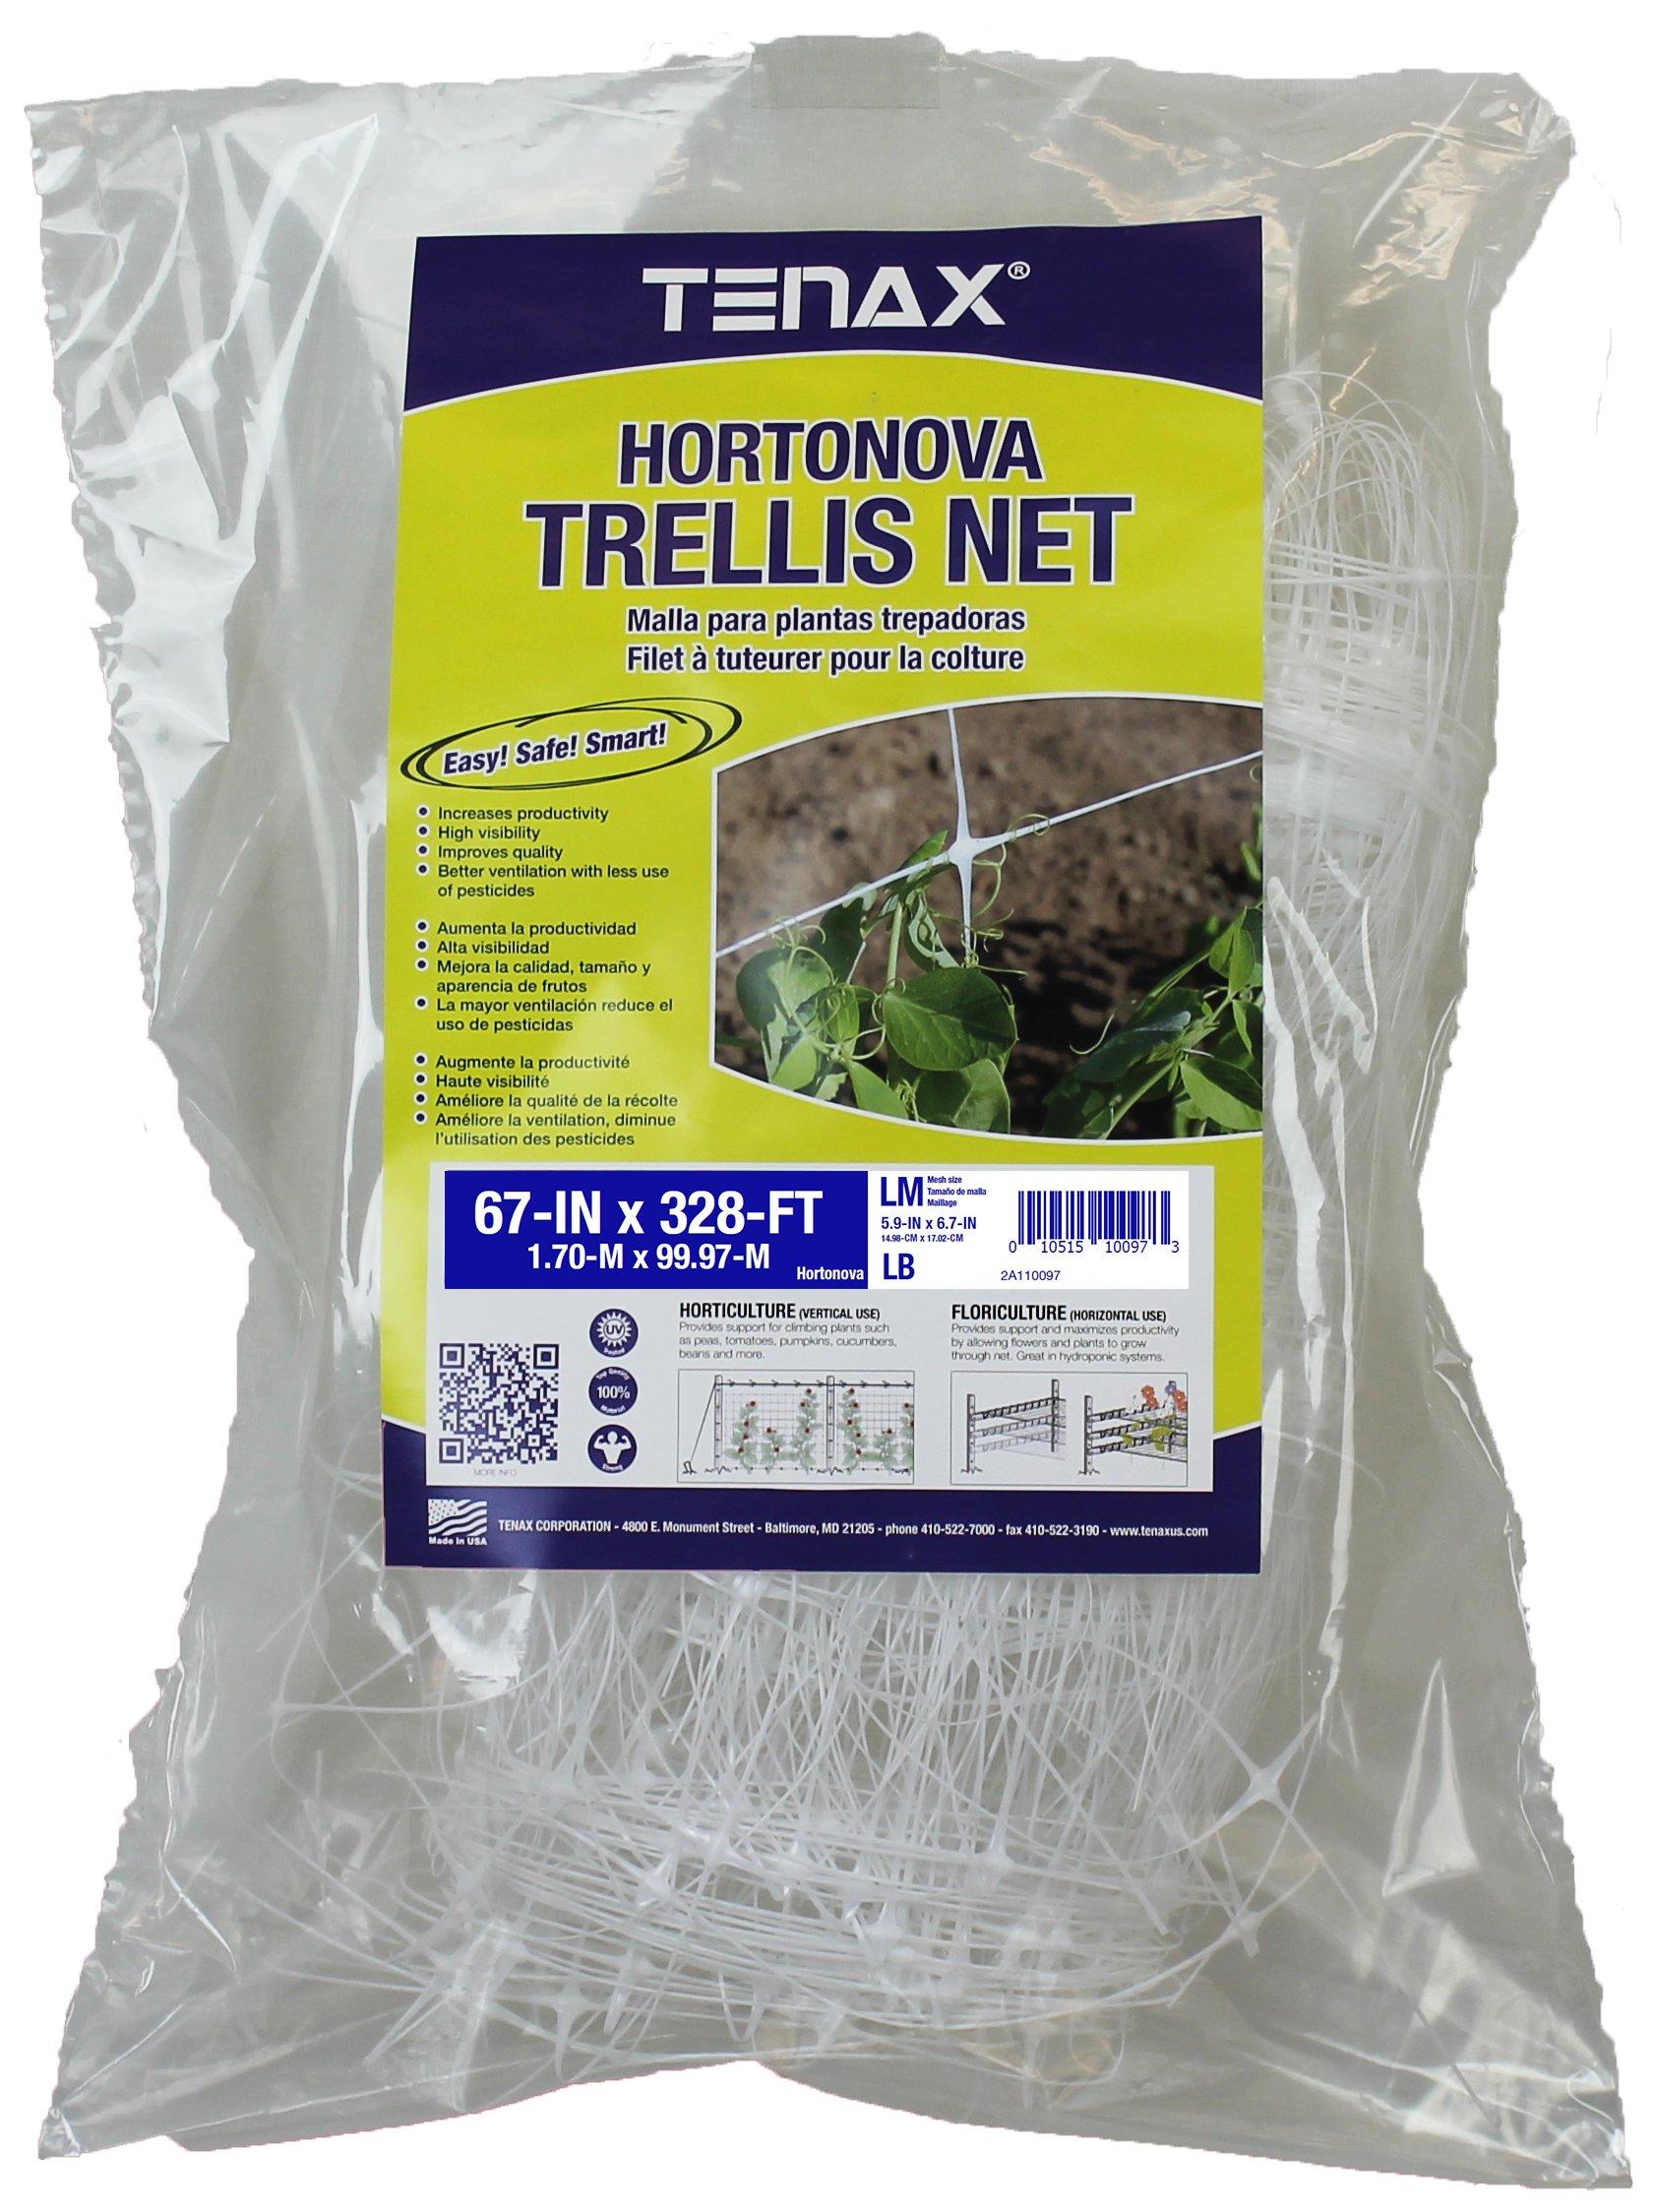 Tenax Hortonova Plant Trellis Net Lm, 67'' x 328', White